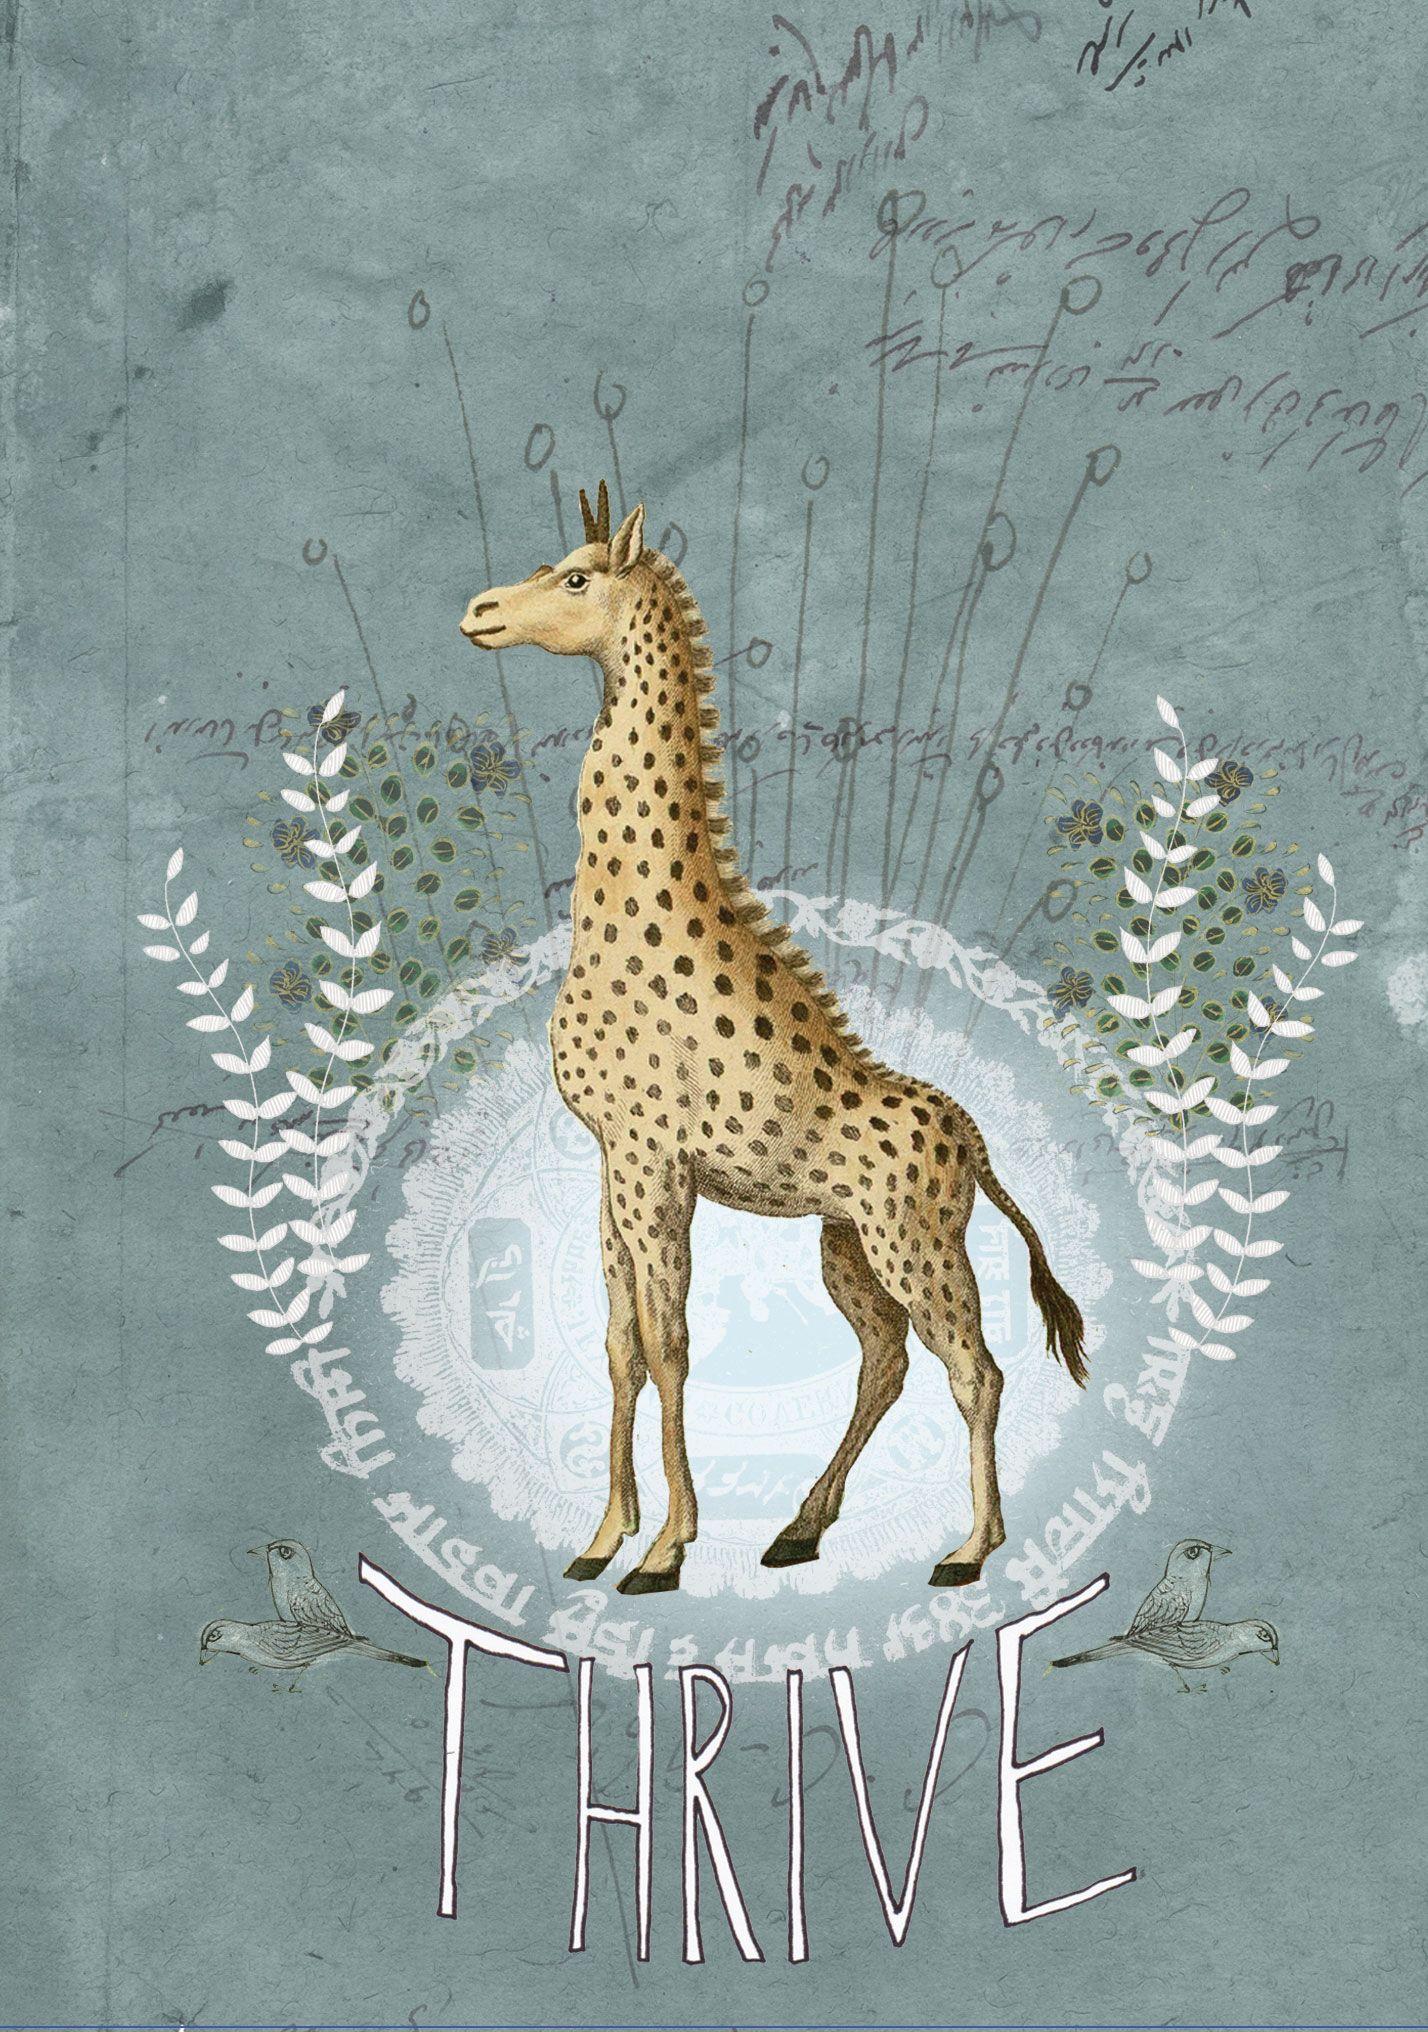 Papaya Thrive Papaya Art Art Giraffe